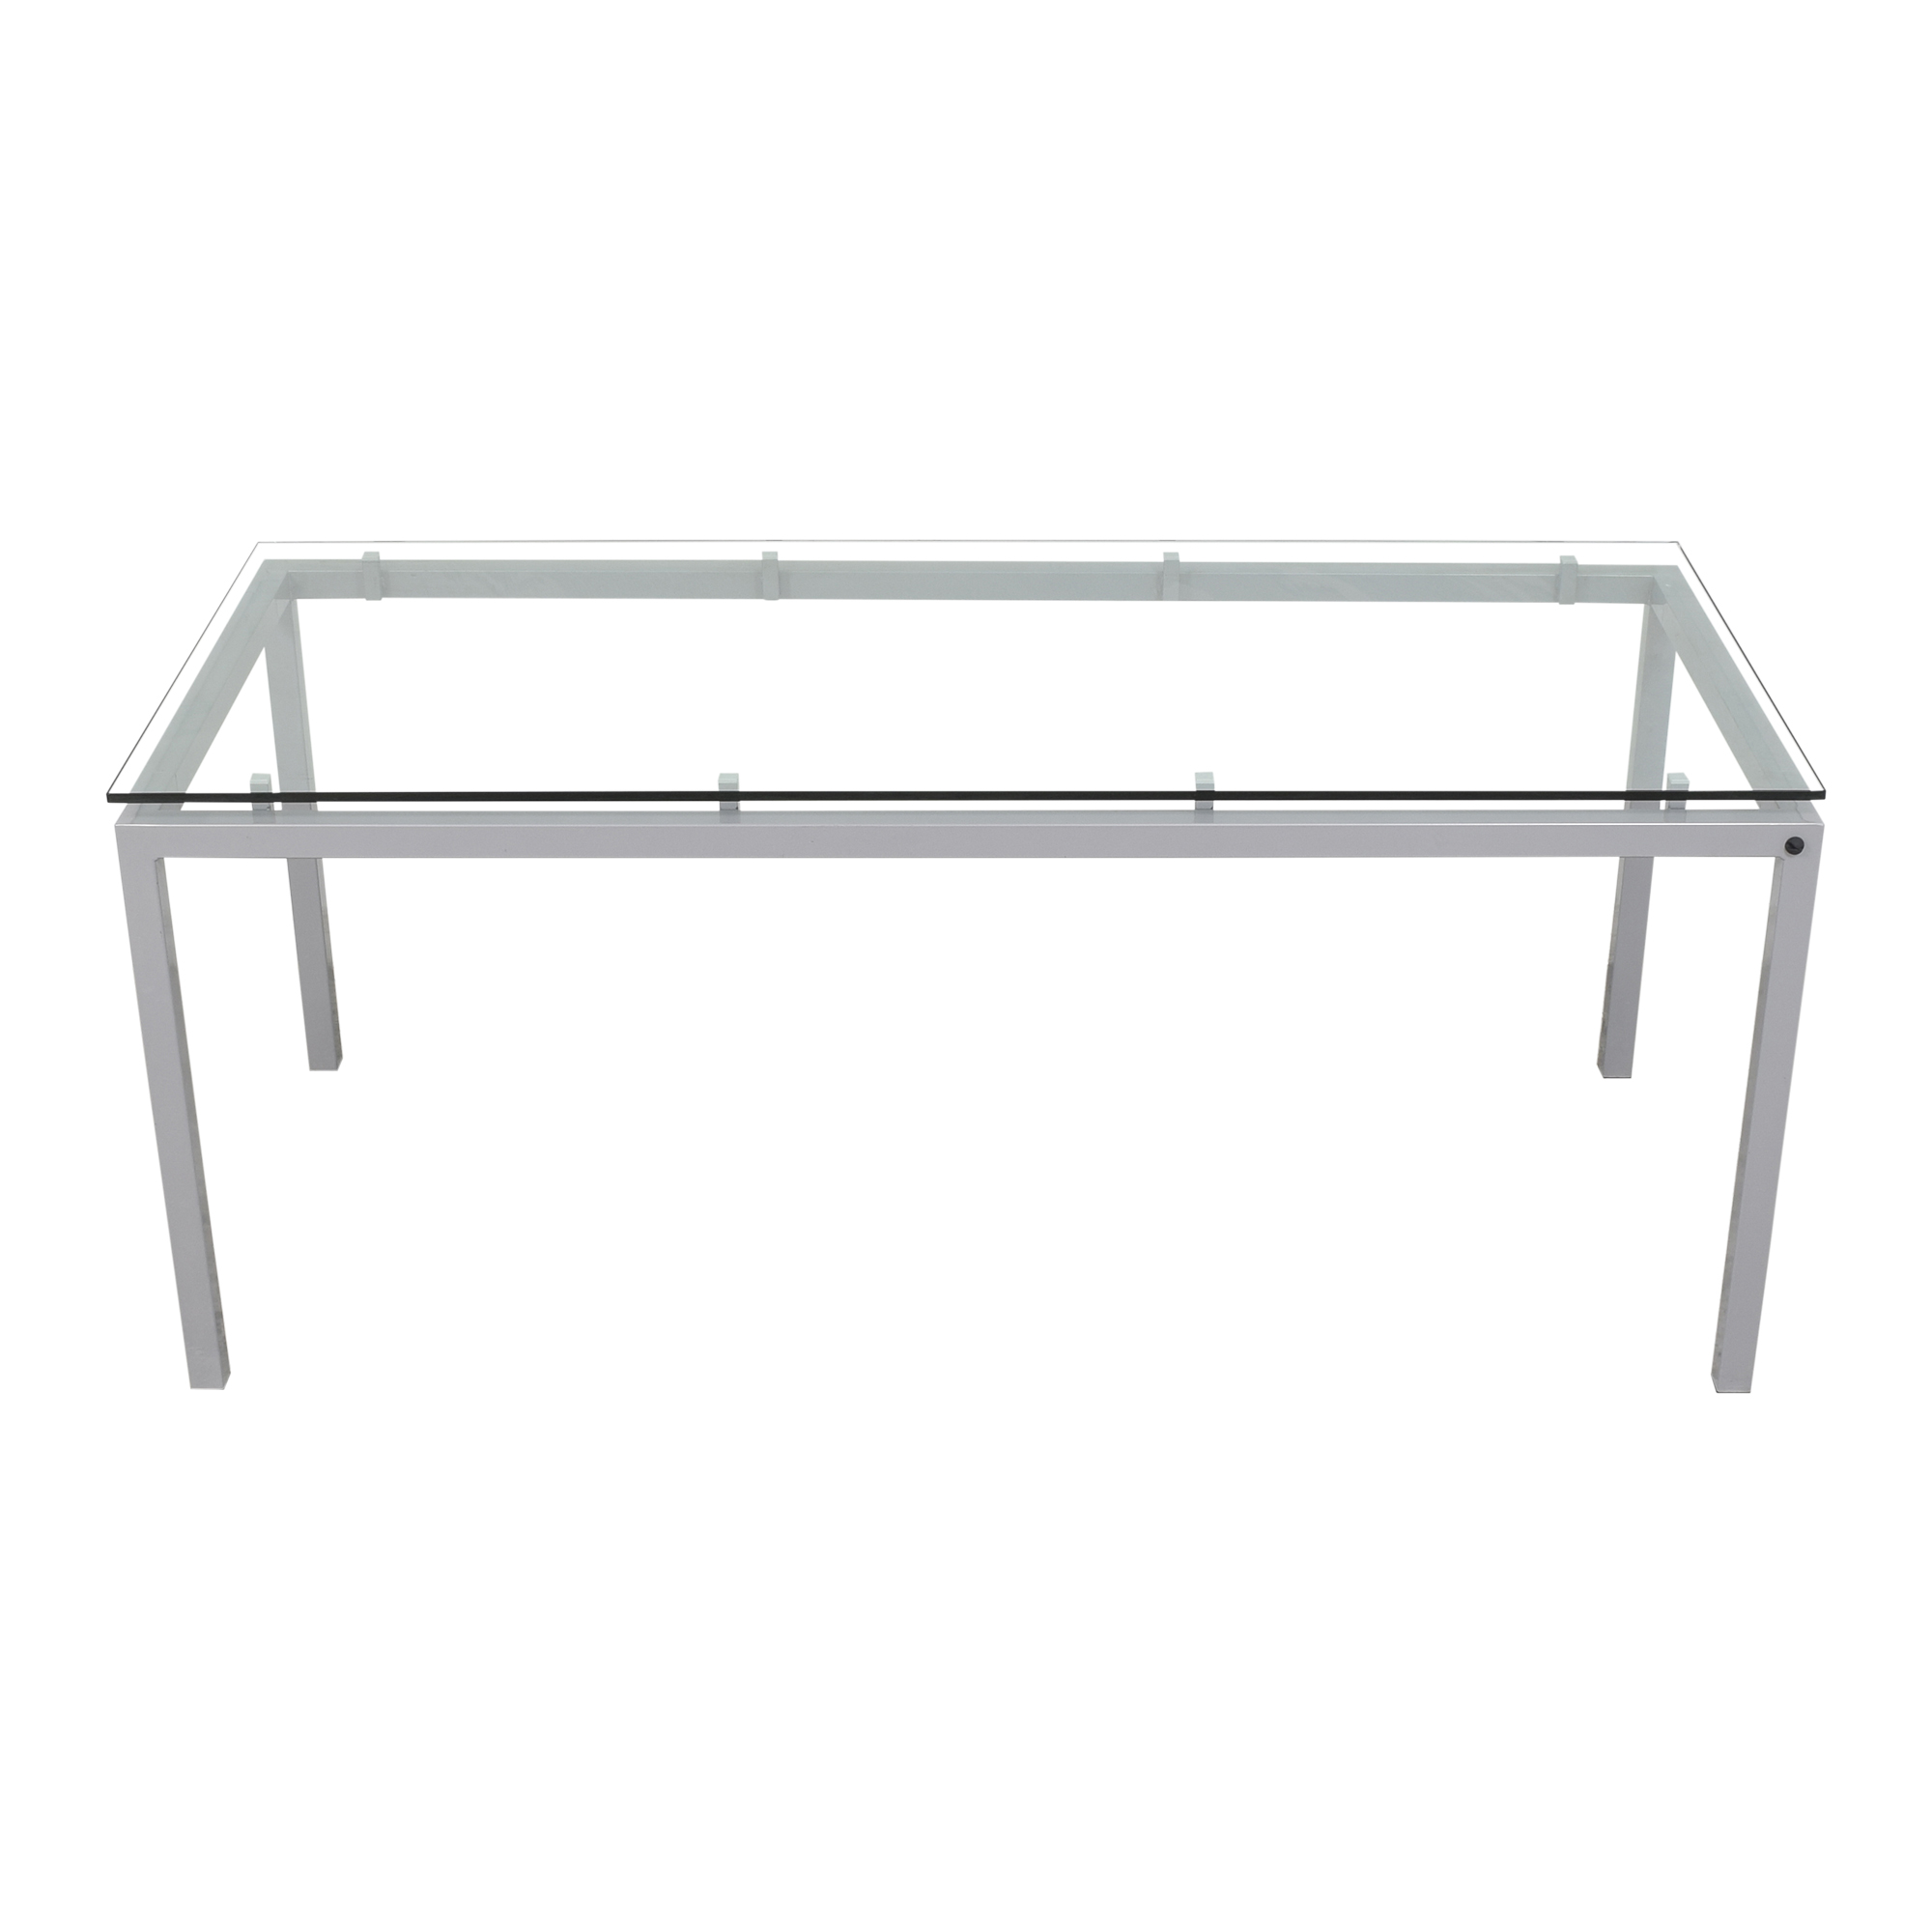 Design Within Reach Design Within Reach Tavola Table ma